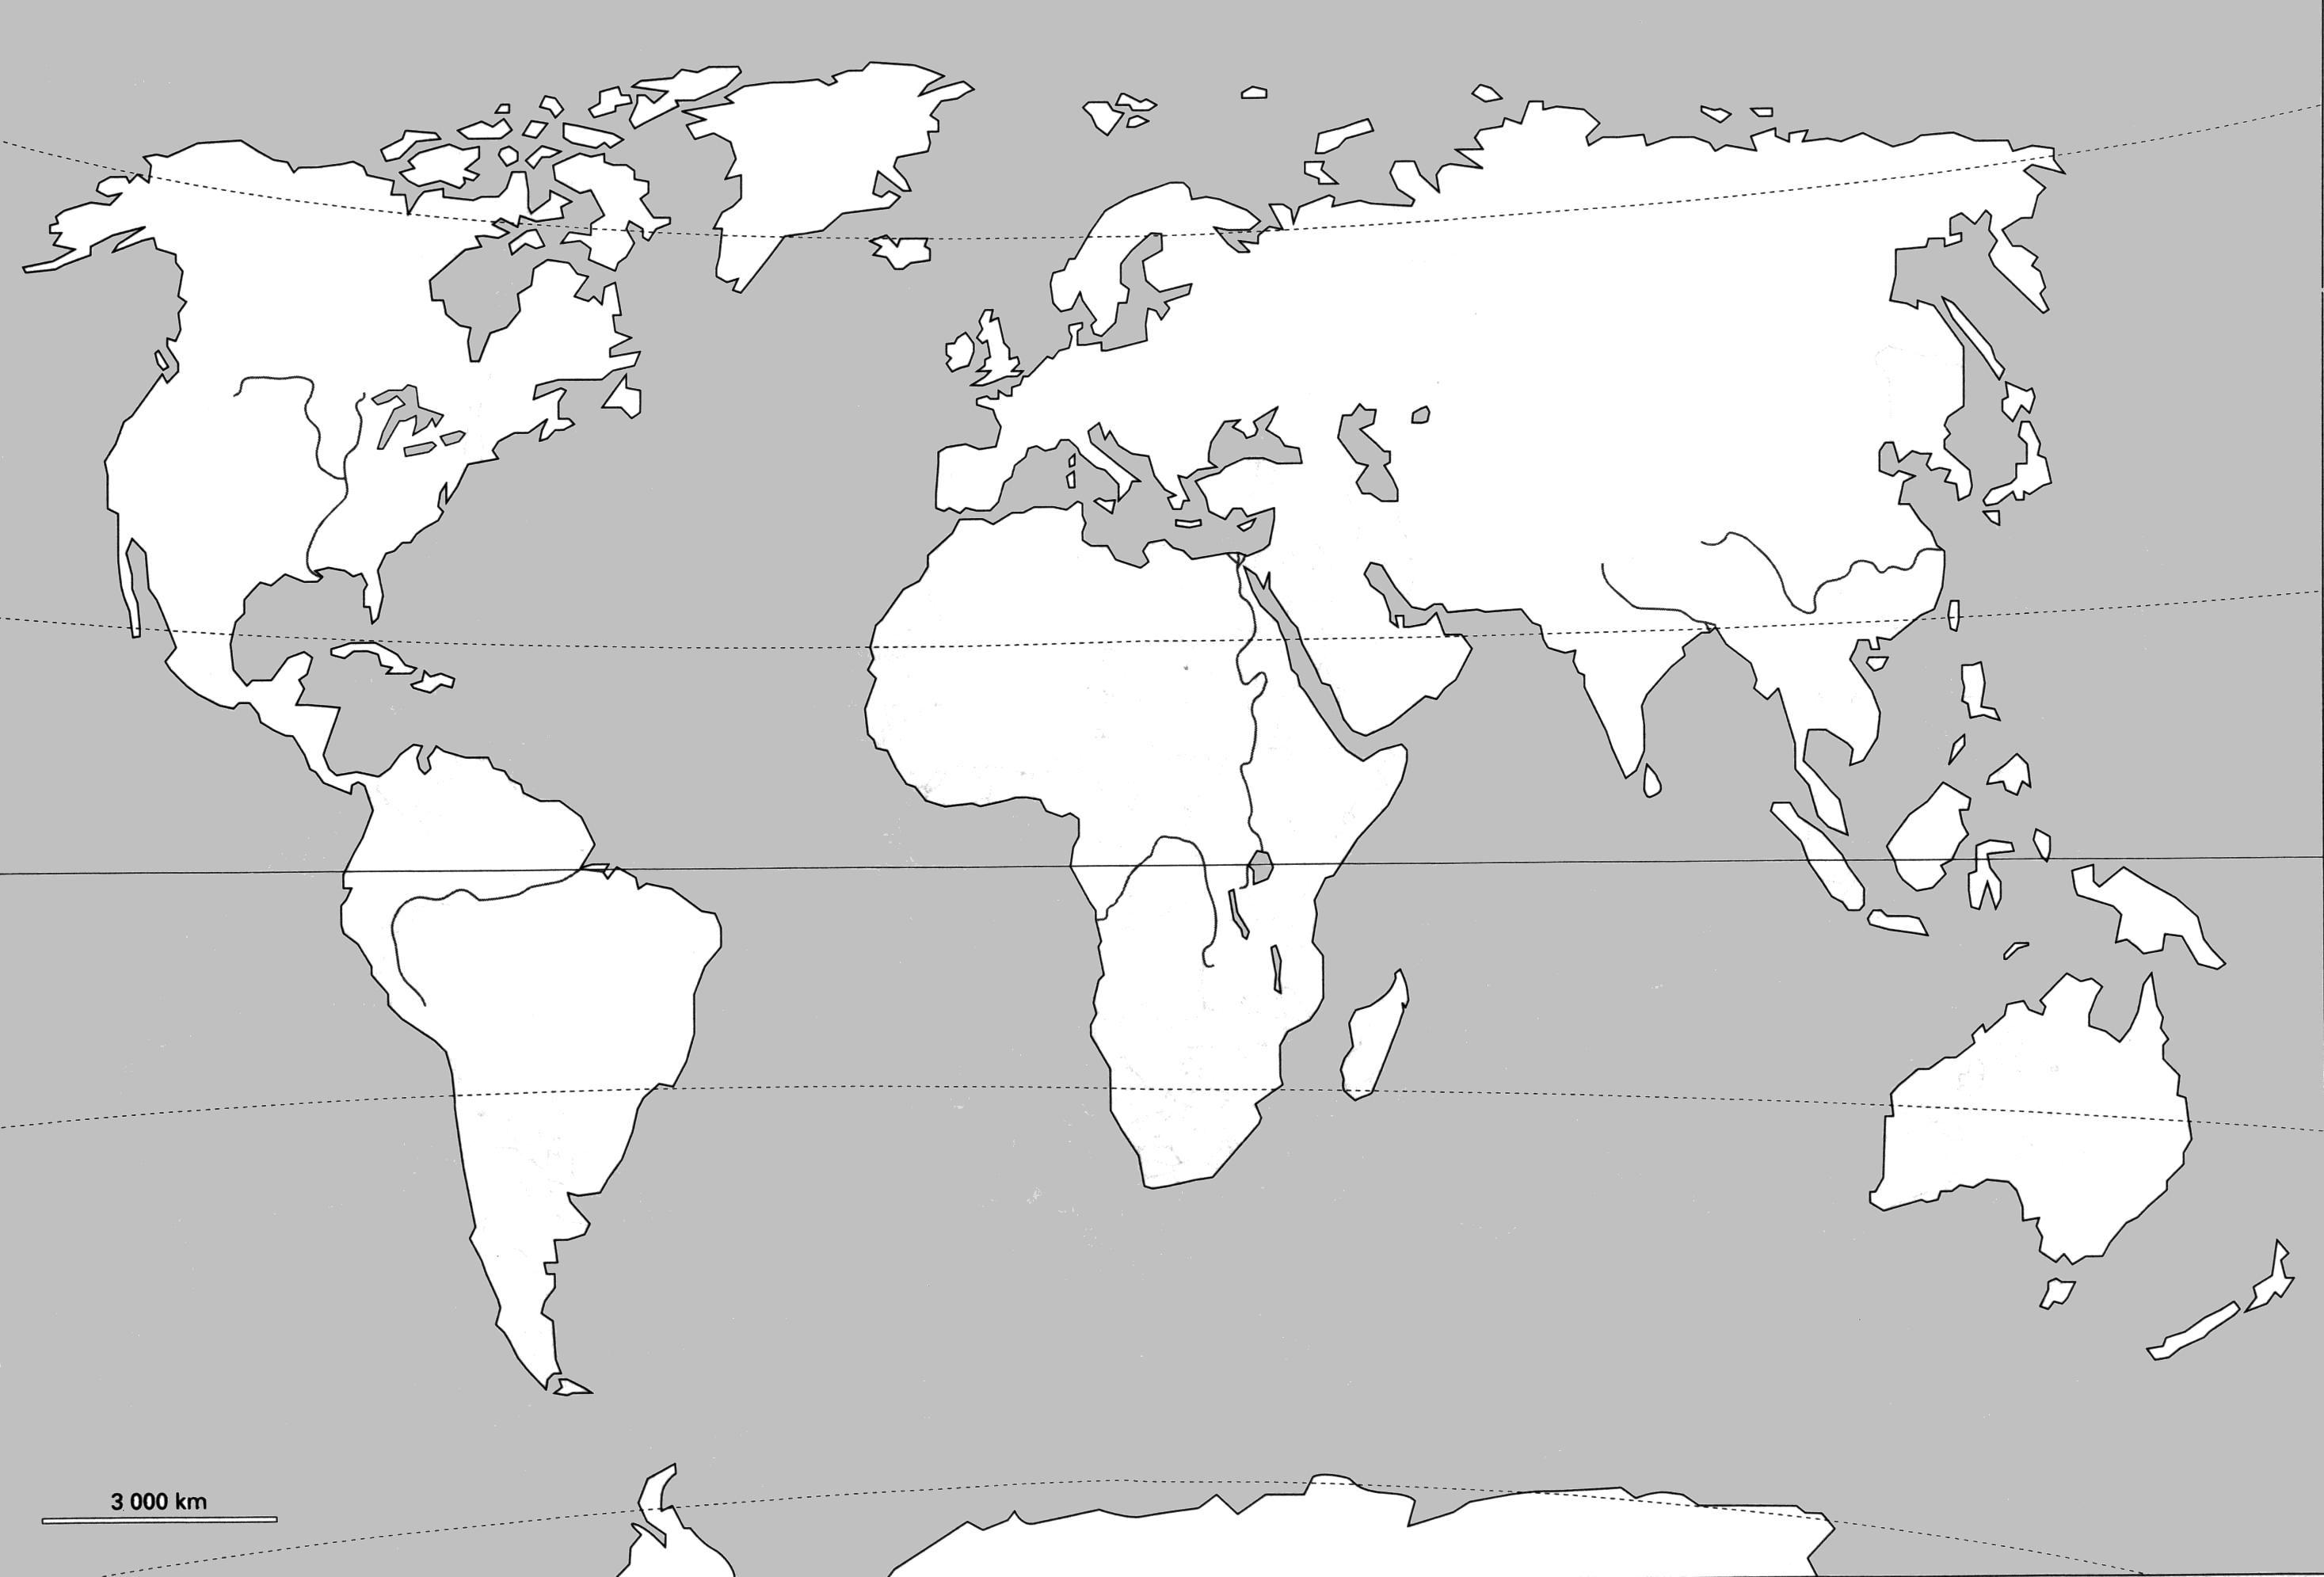 Carte du monde vierge cartes pinterest carte du for Carte du monde maison du monde